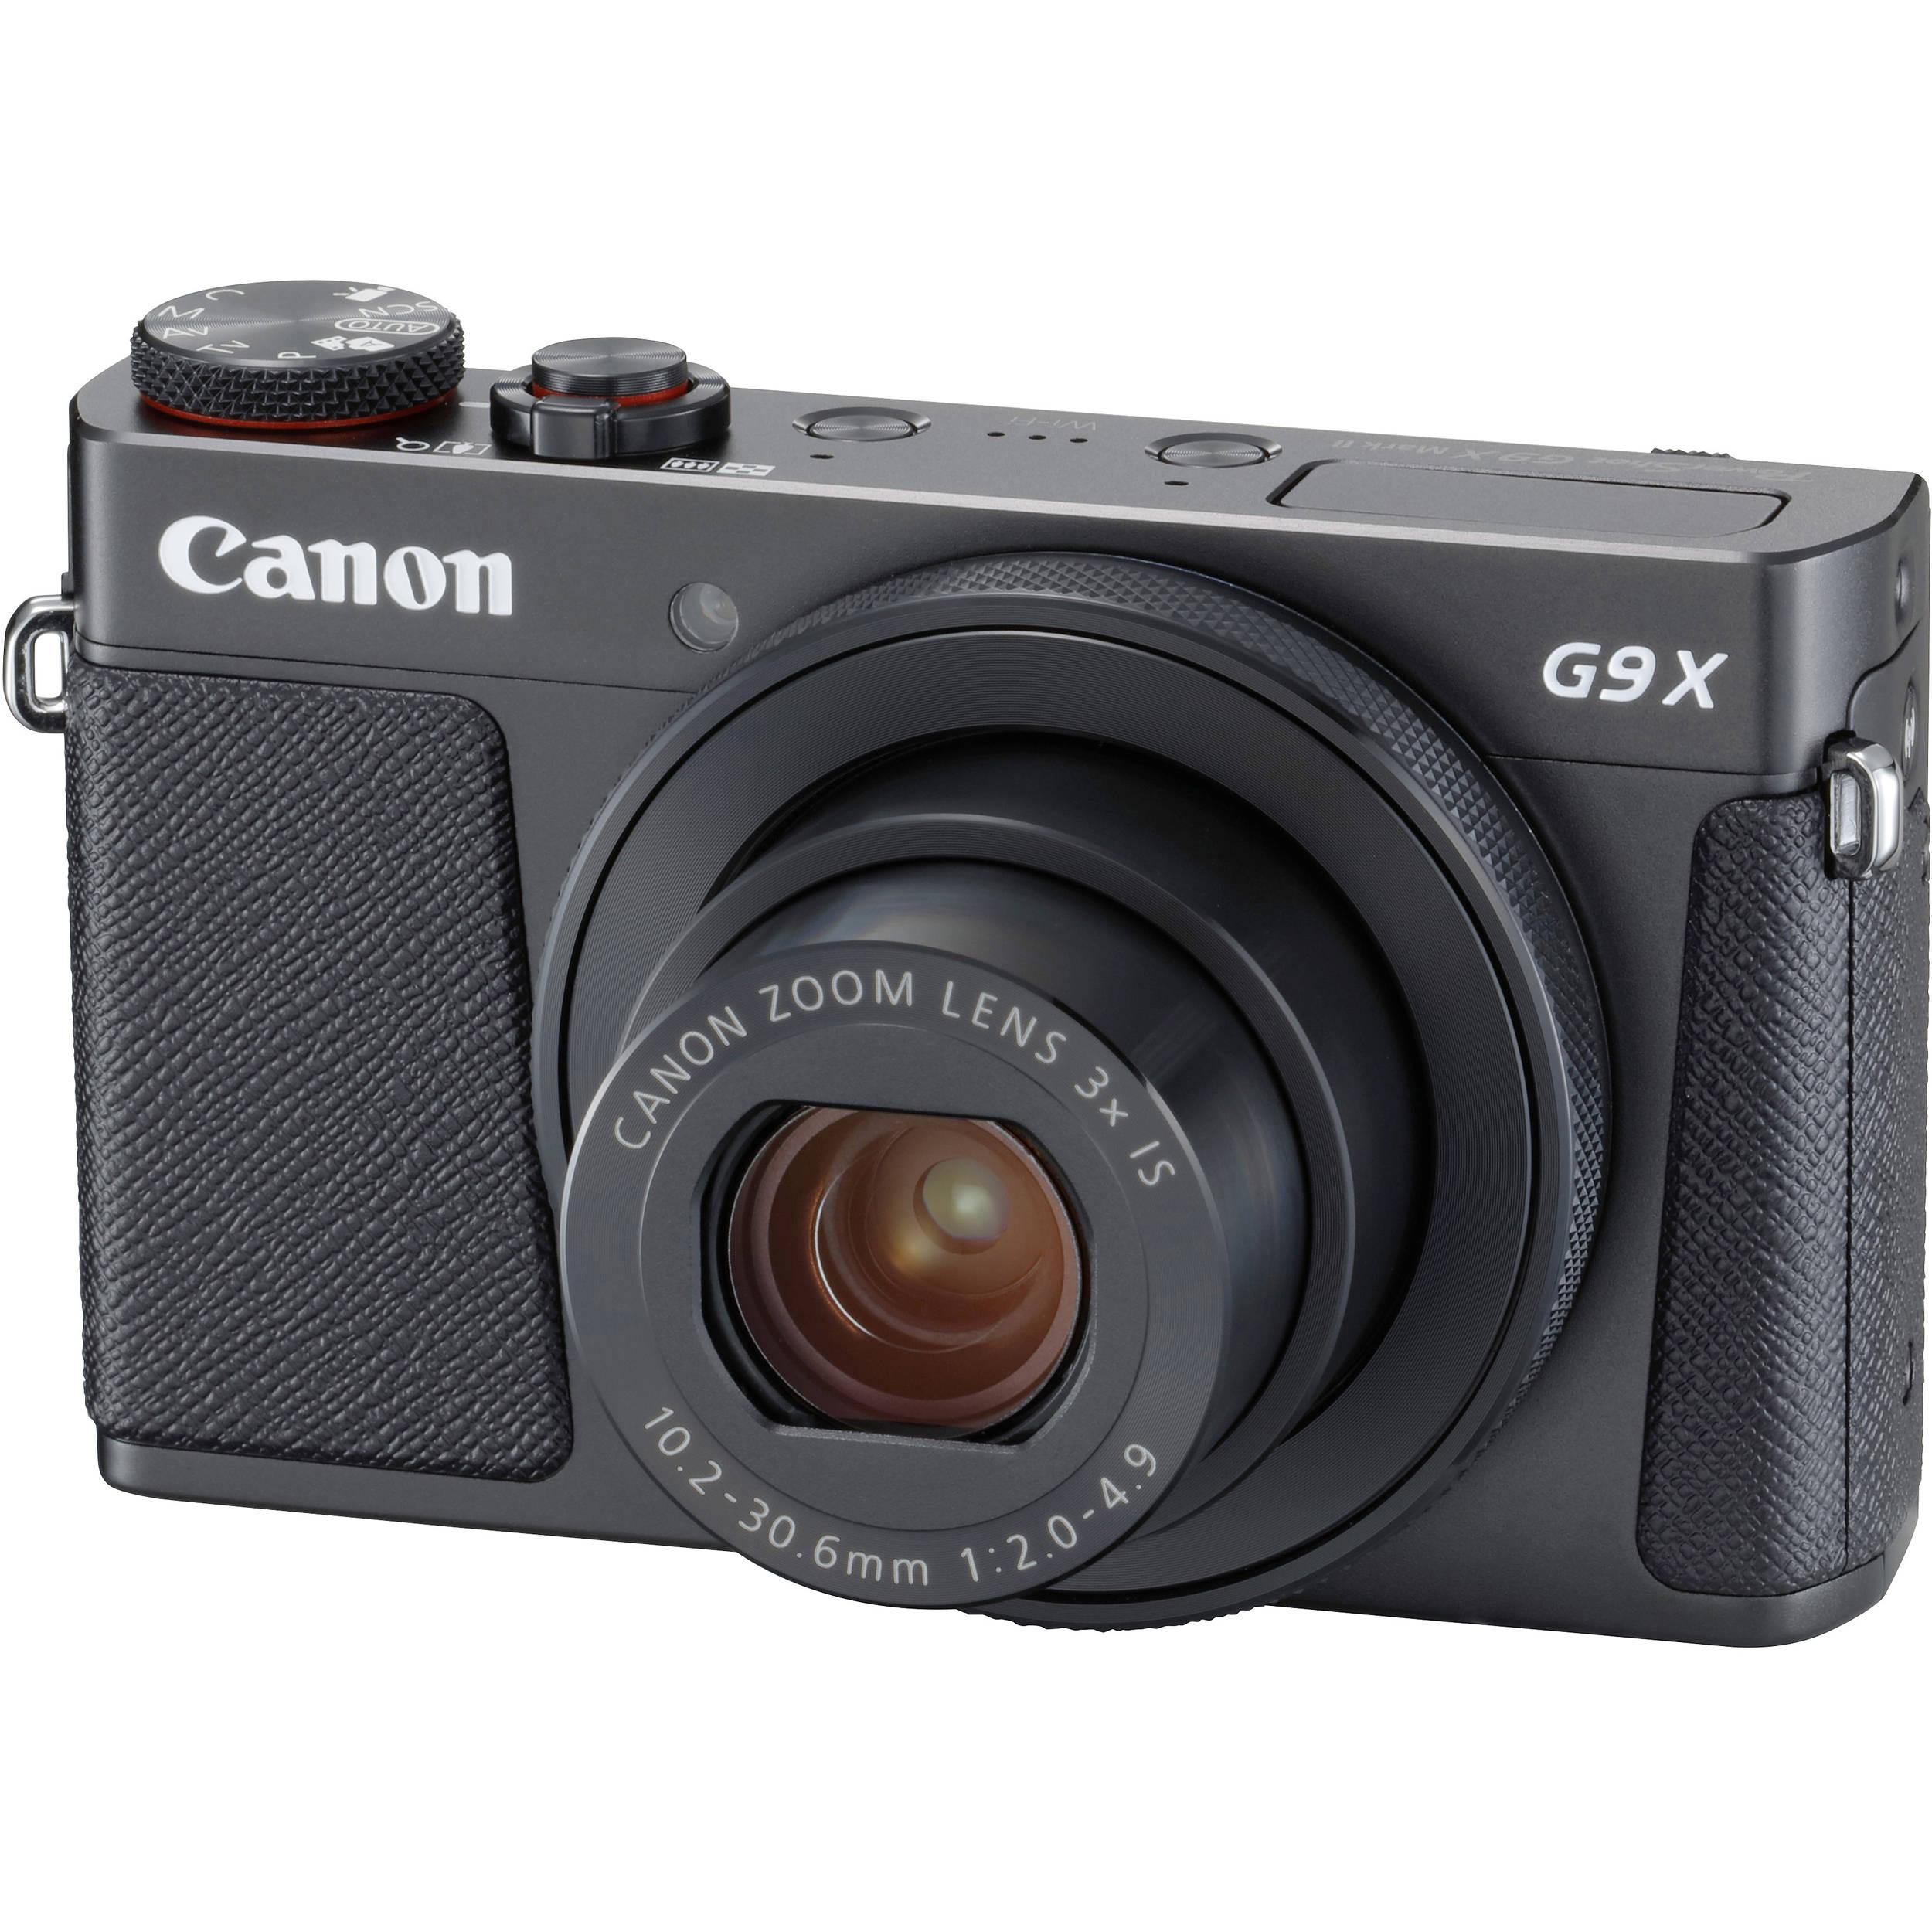 Digitalni Fotoaparati I Oprema Kompaktni Prosumer Dslr Canon Powershot Sx430 Is Kamera G9 X Mark Ii